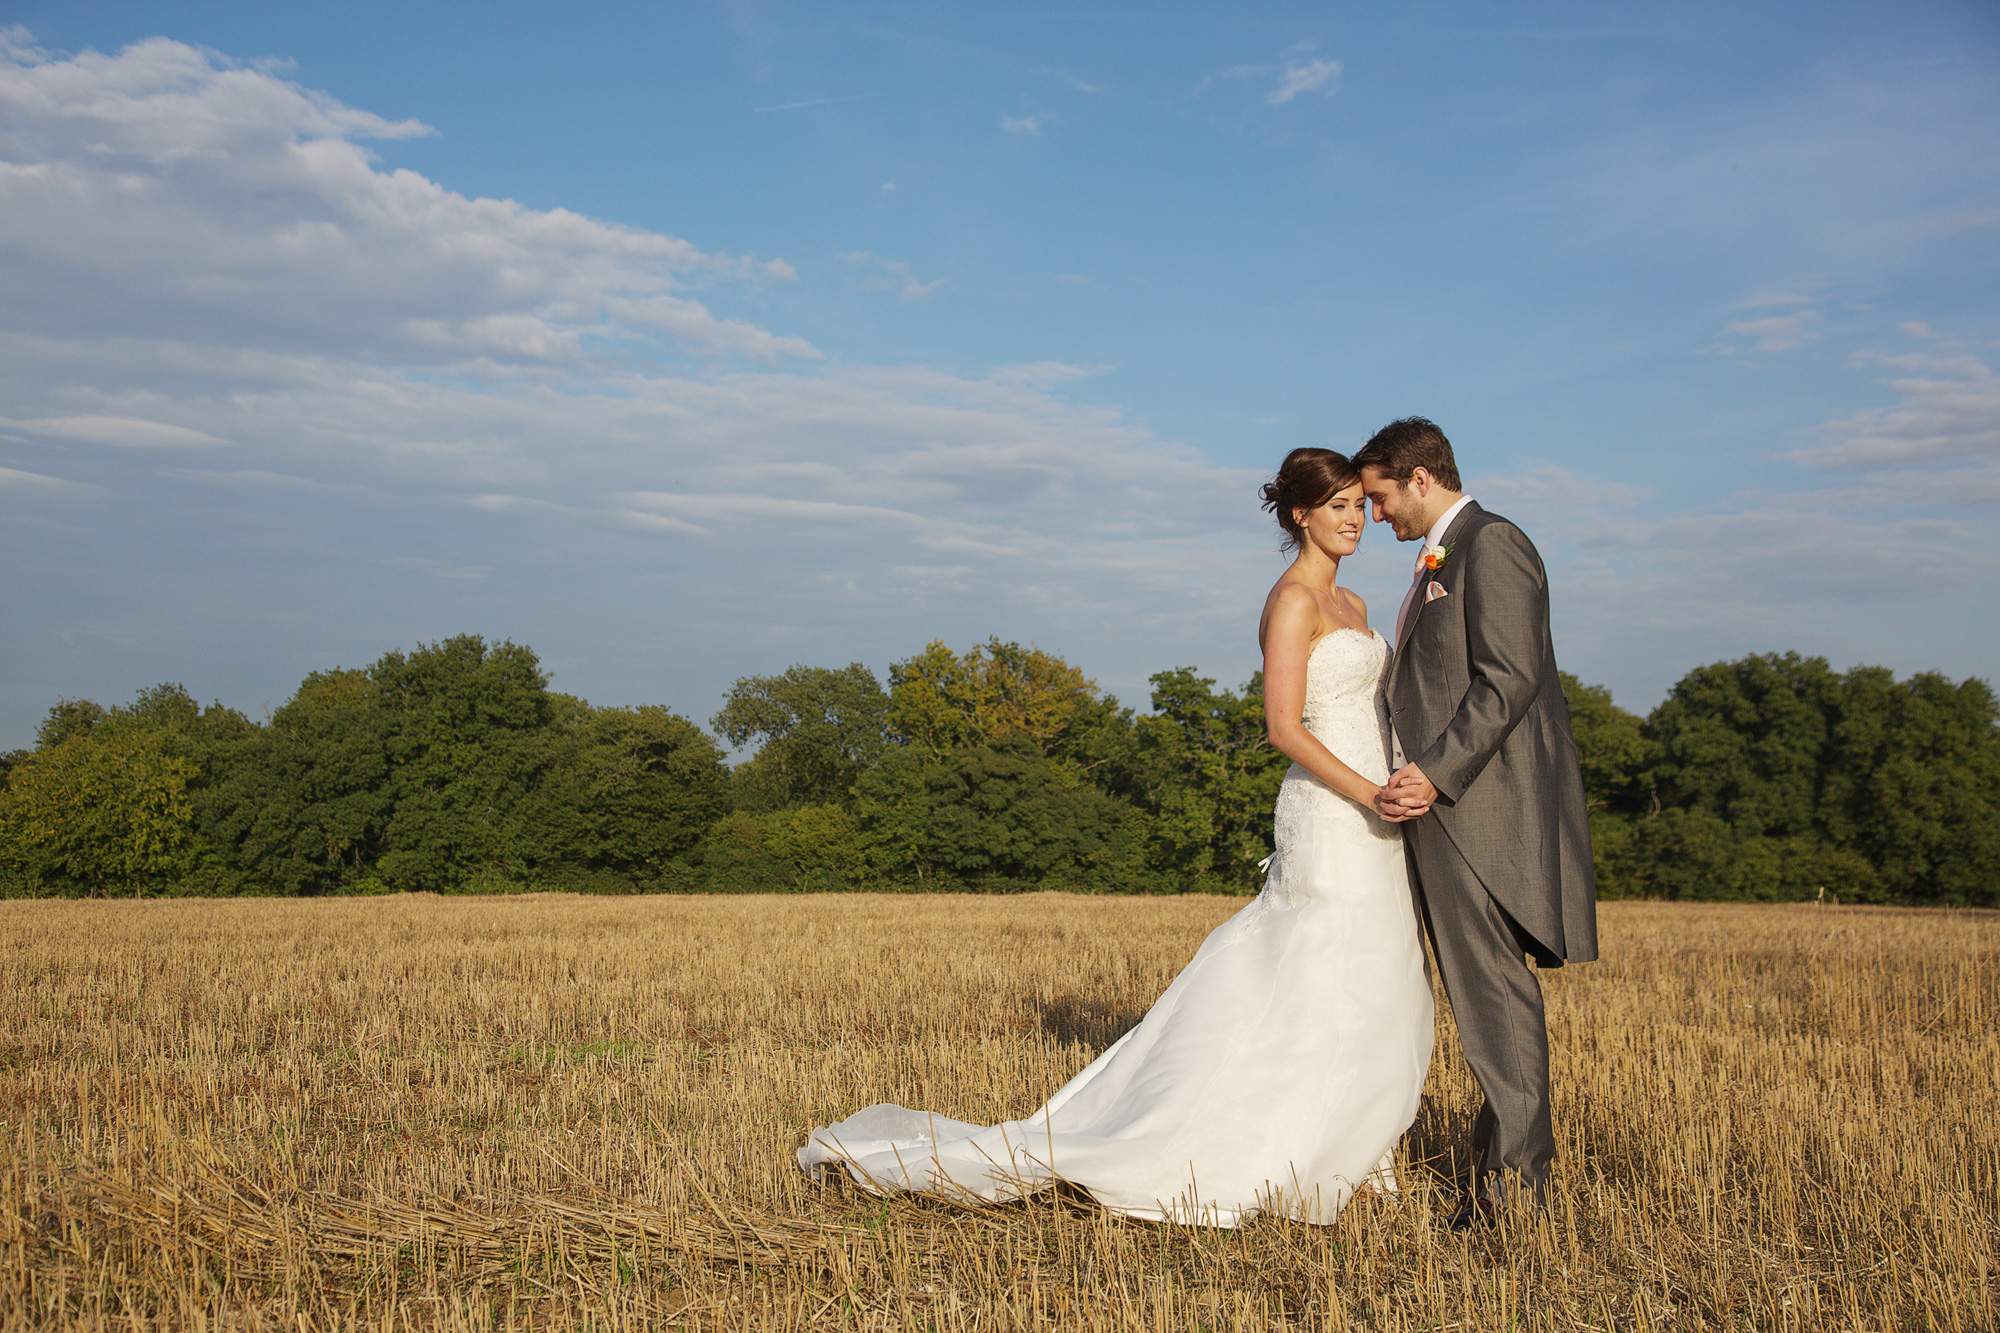 Adam_Hillier_Wedding_Photographer_Newbury_Berkshire_3 (7).jpg